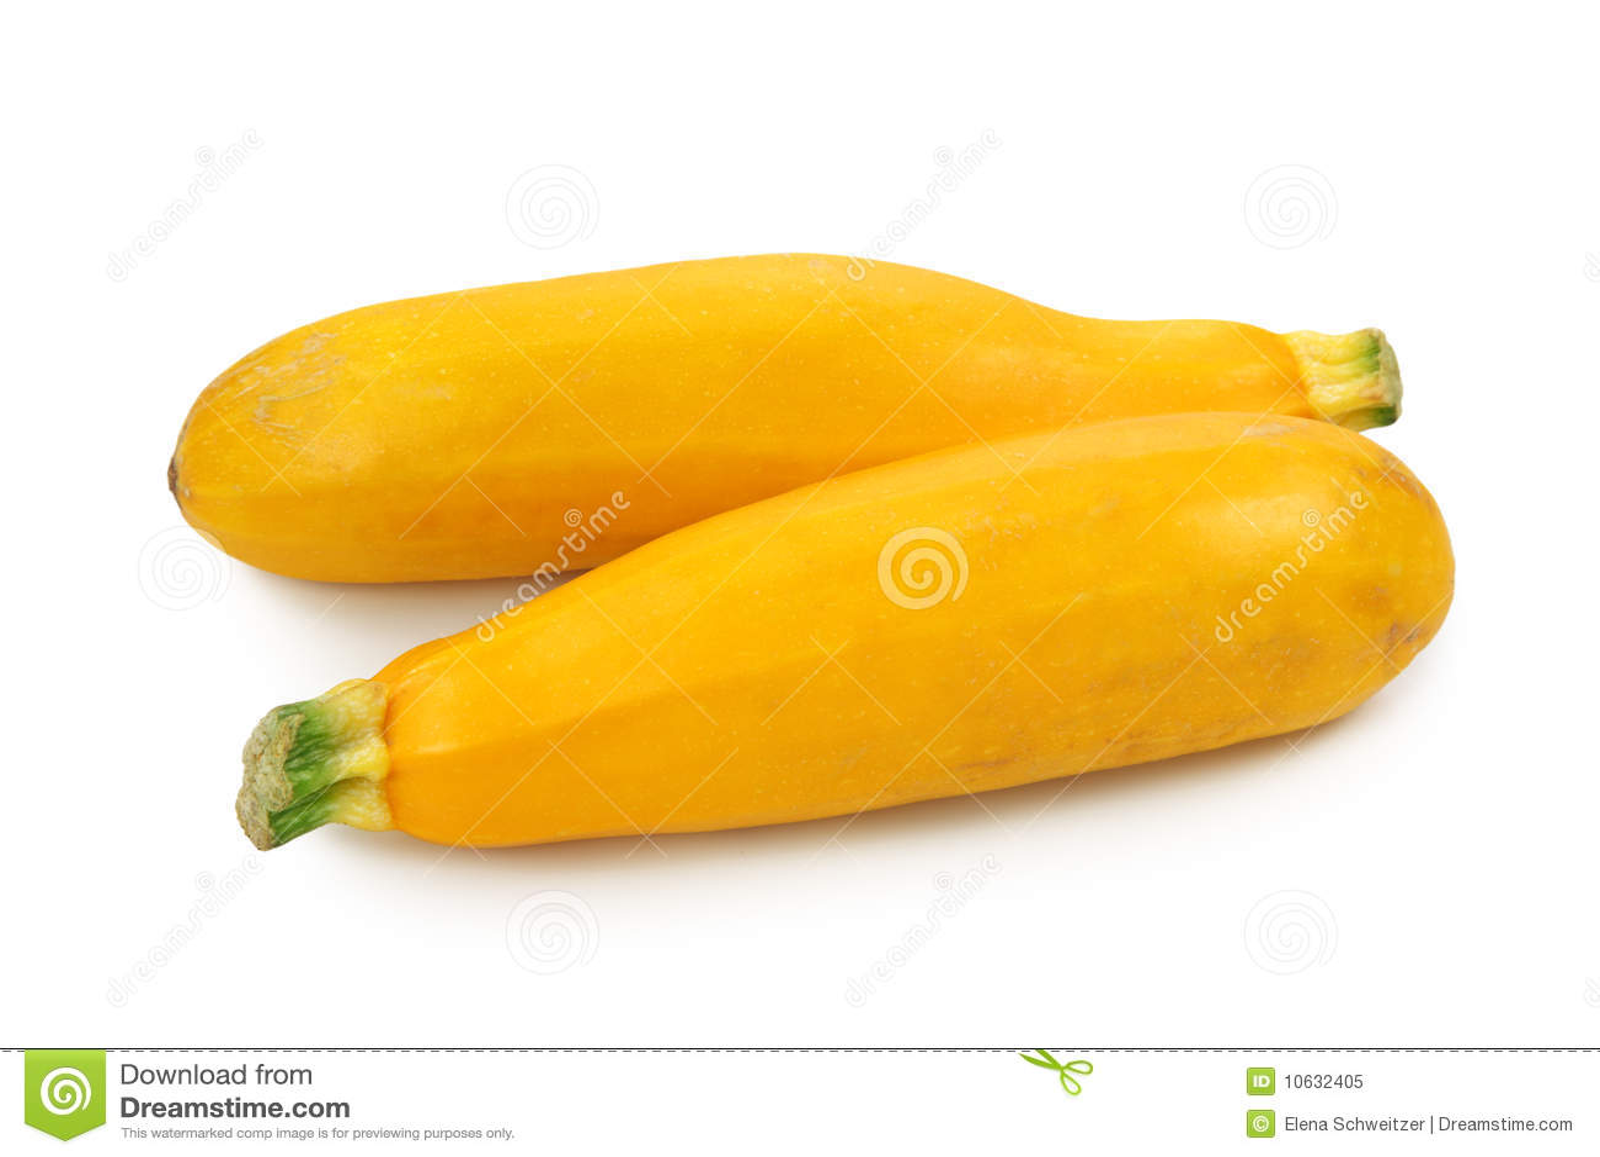 gelbe zucchini lizenzfreies stockfoto bild 10632405. Black Bedroom Furniture Sets. Home Design Ideas